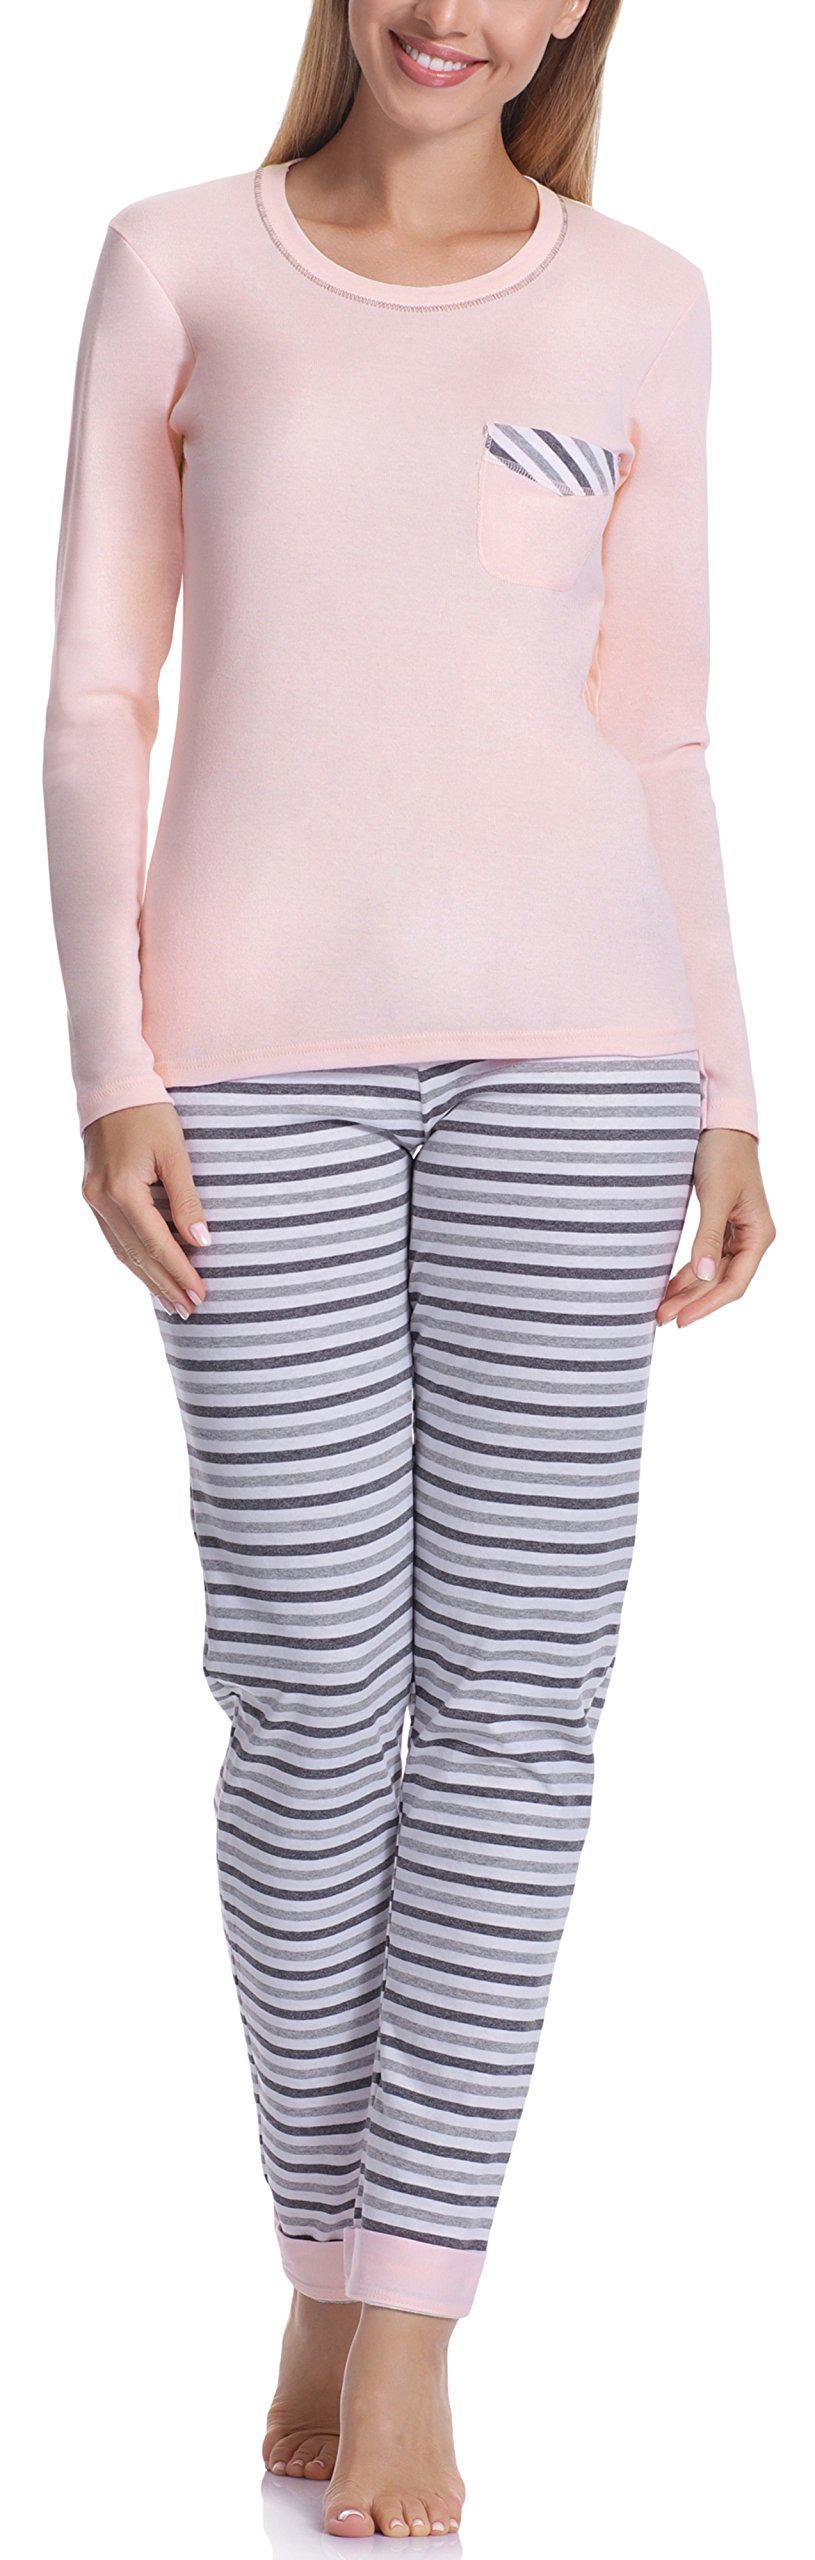 Italian Fashion IF Pijama Camiseta y Pantalones Mujer N1NC6 M007